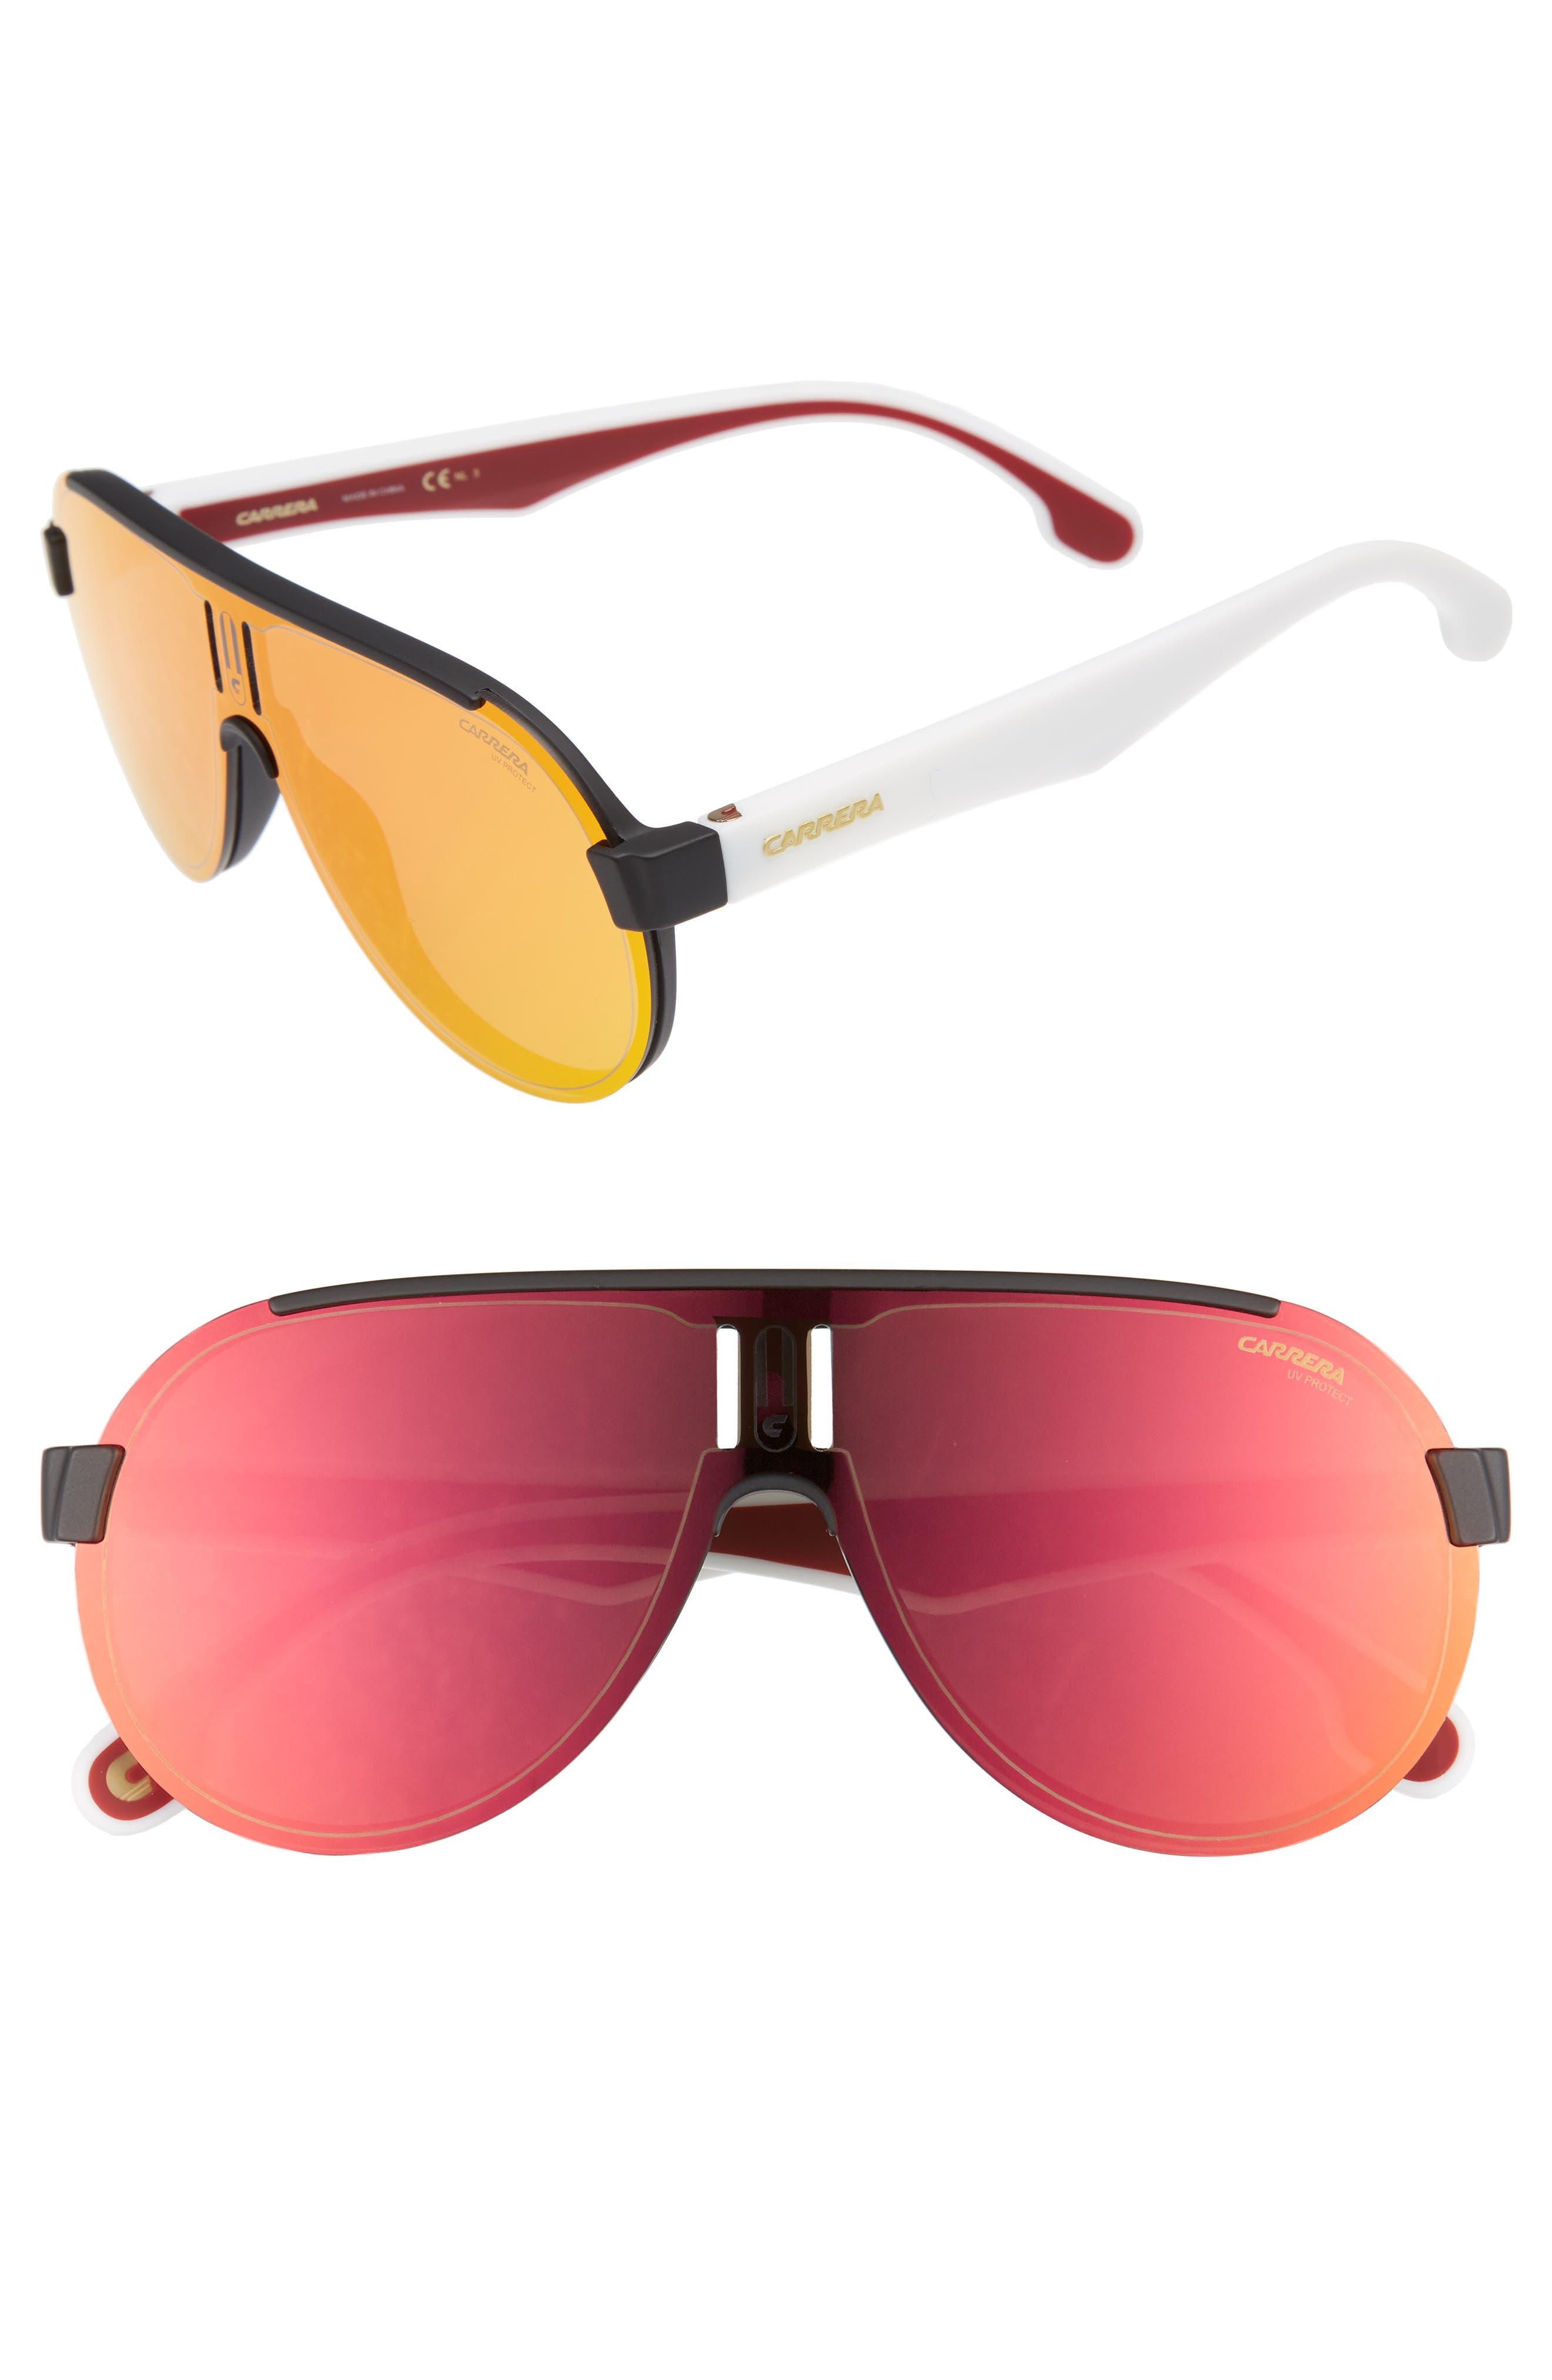 Carrera Eyewear 9m Shield Sunglasses - Matte Black White/ Red Mirror